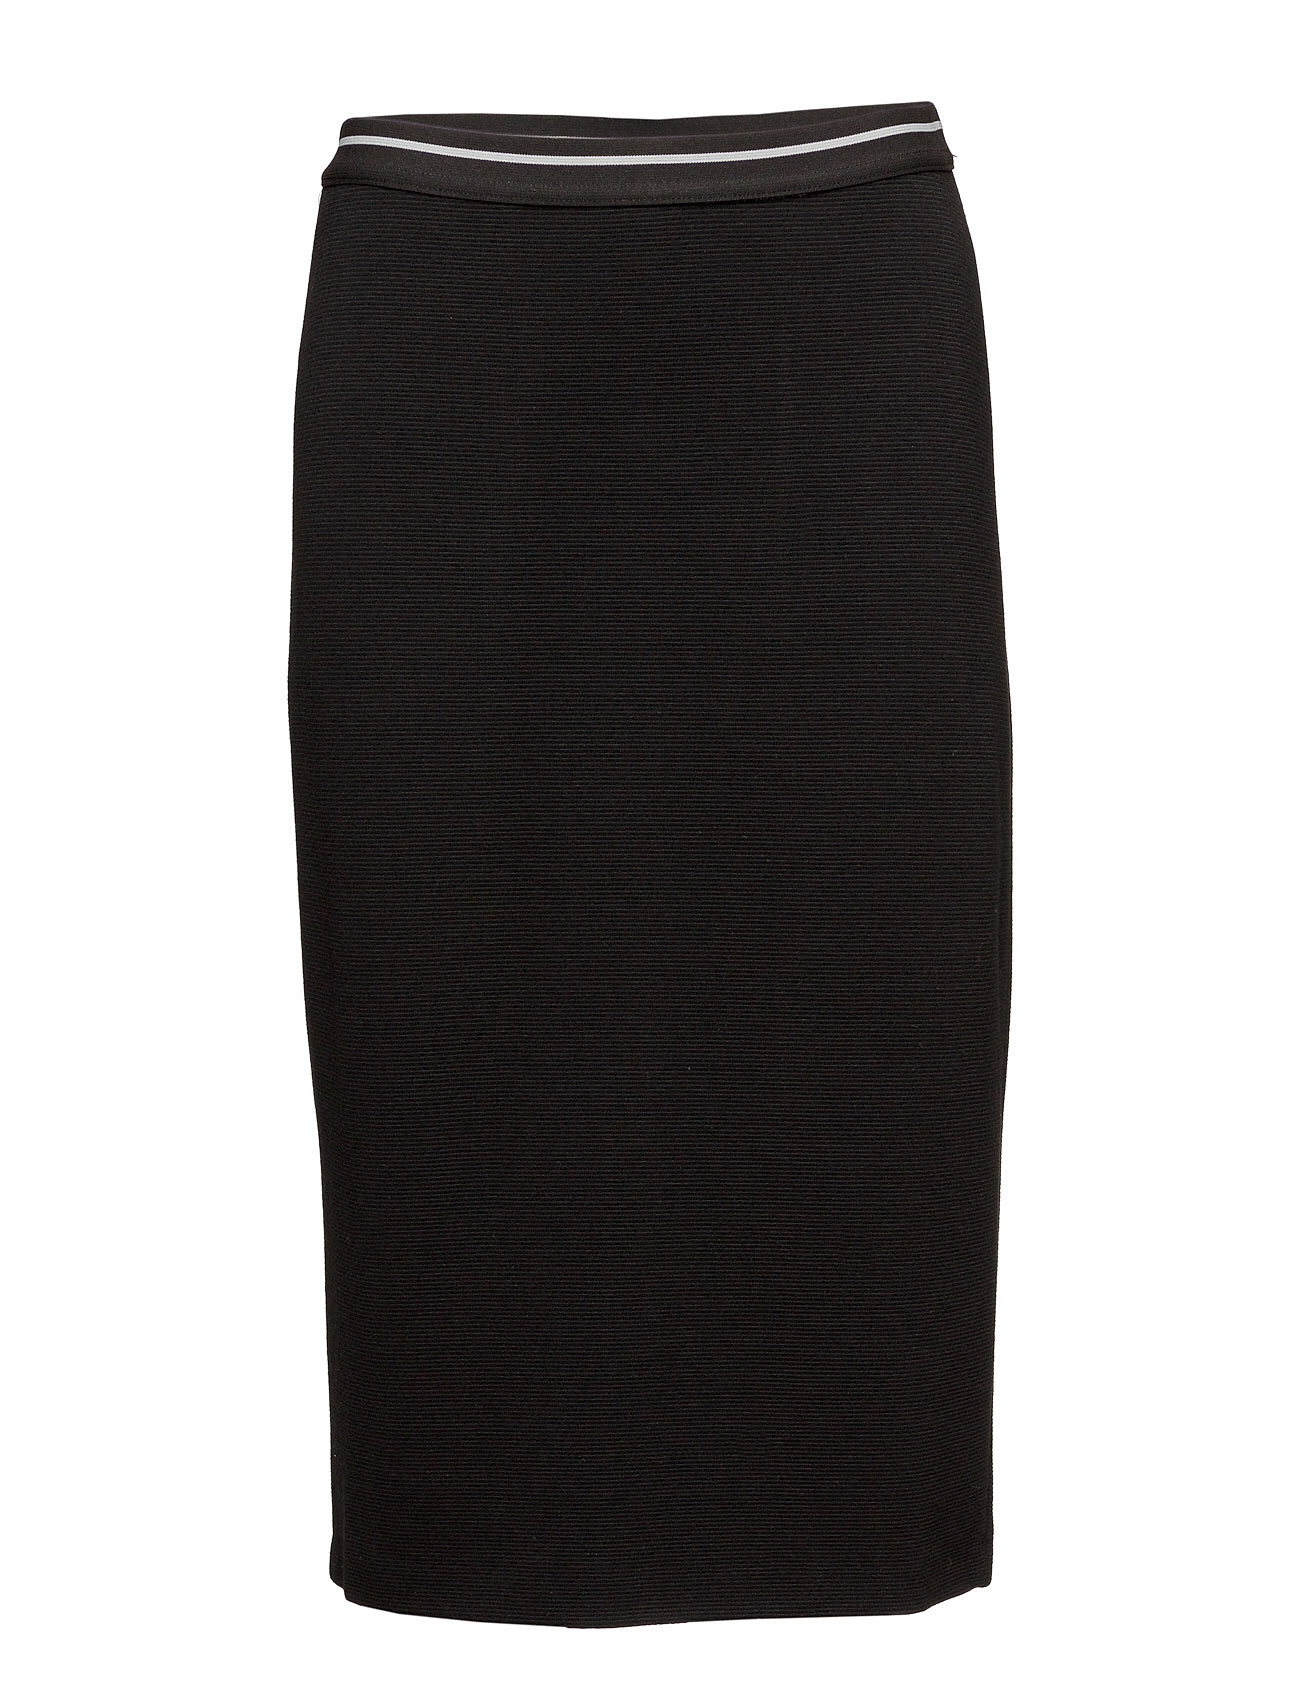 Skirt Short Woven Fa Gerry Weber Edition Skirts thumbnail